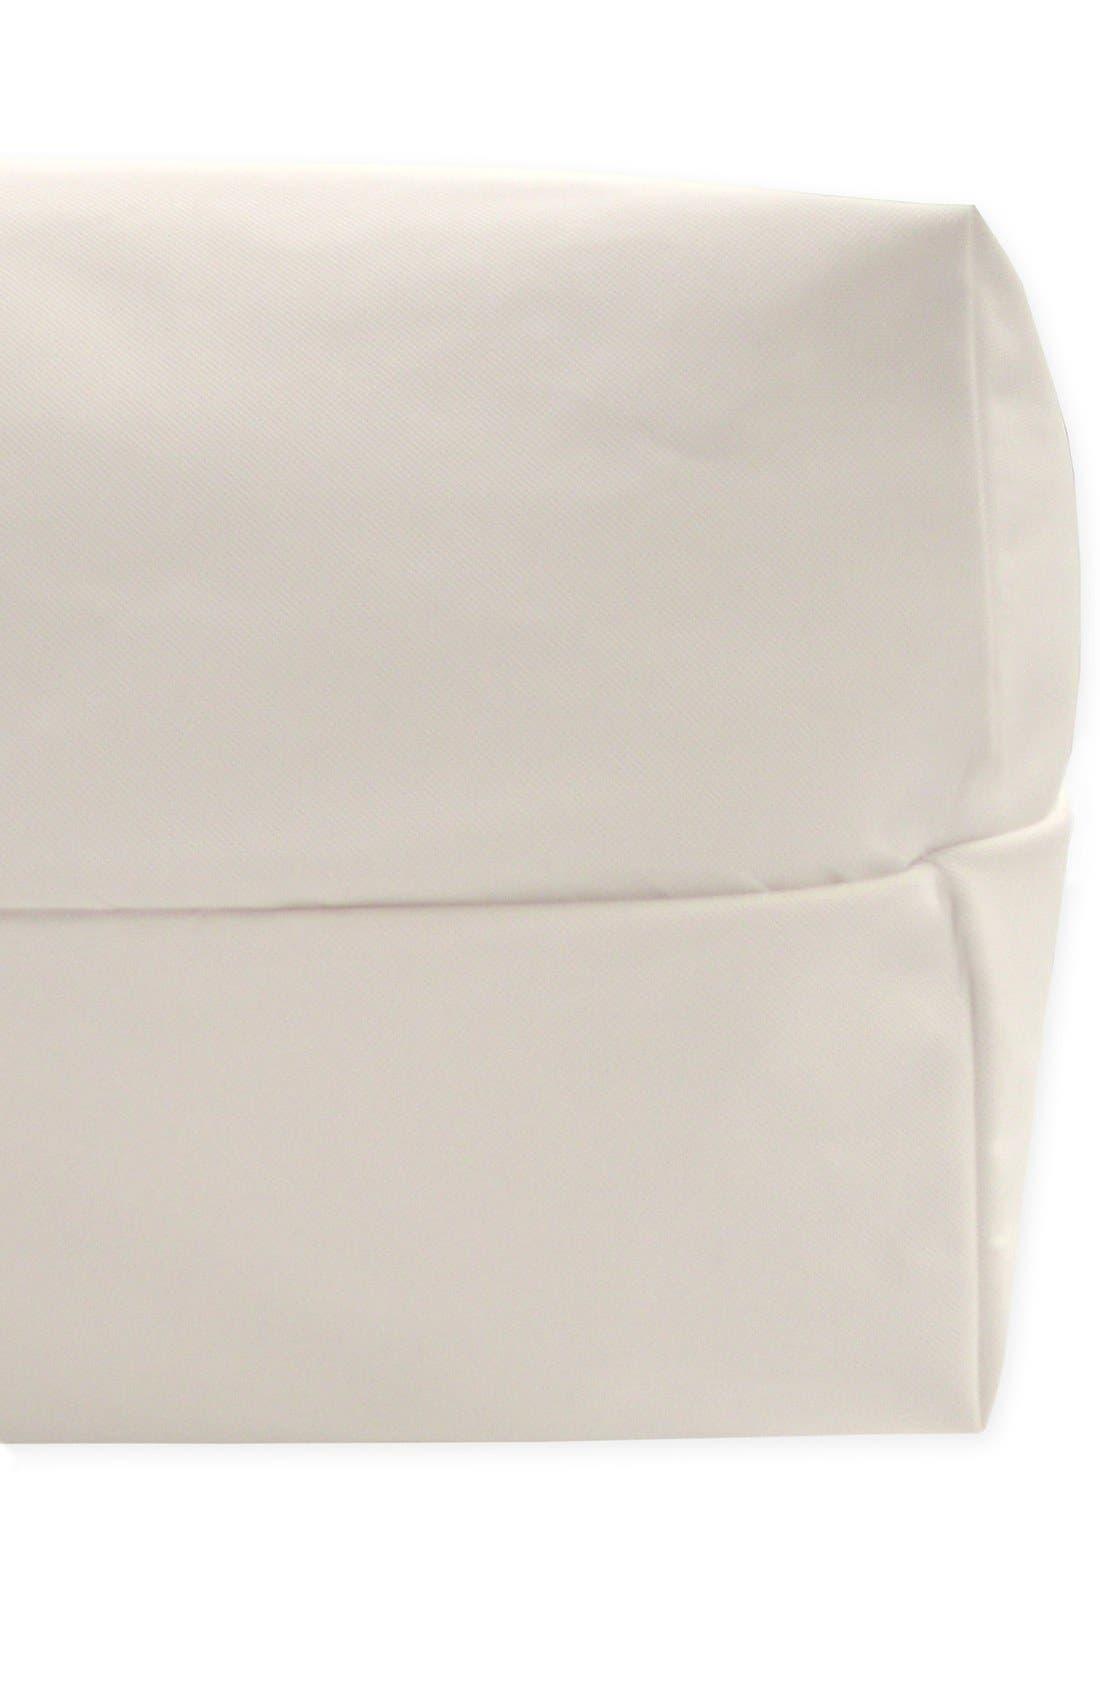 Lightweight Organic Cotton Classic 2-Stage Crib Mattress,                             Alternate thumbnail 2, color,                             100